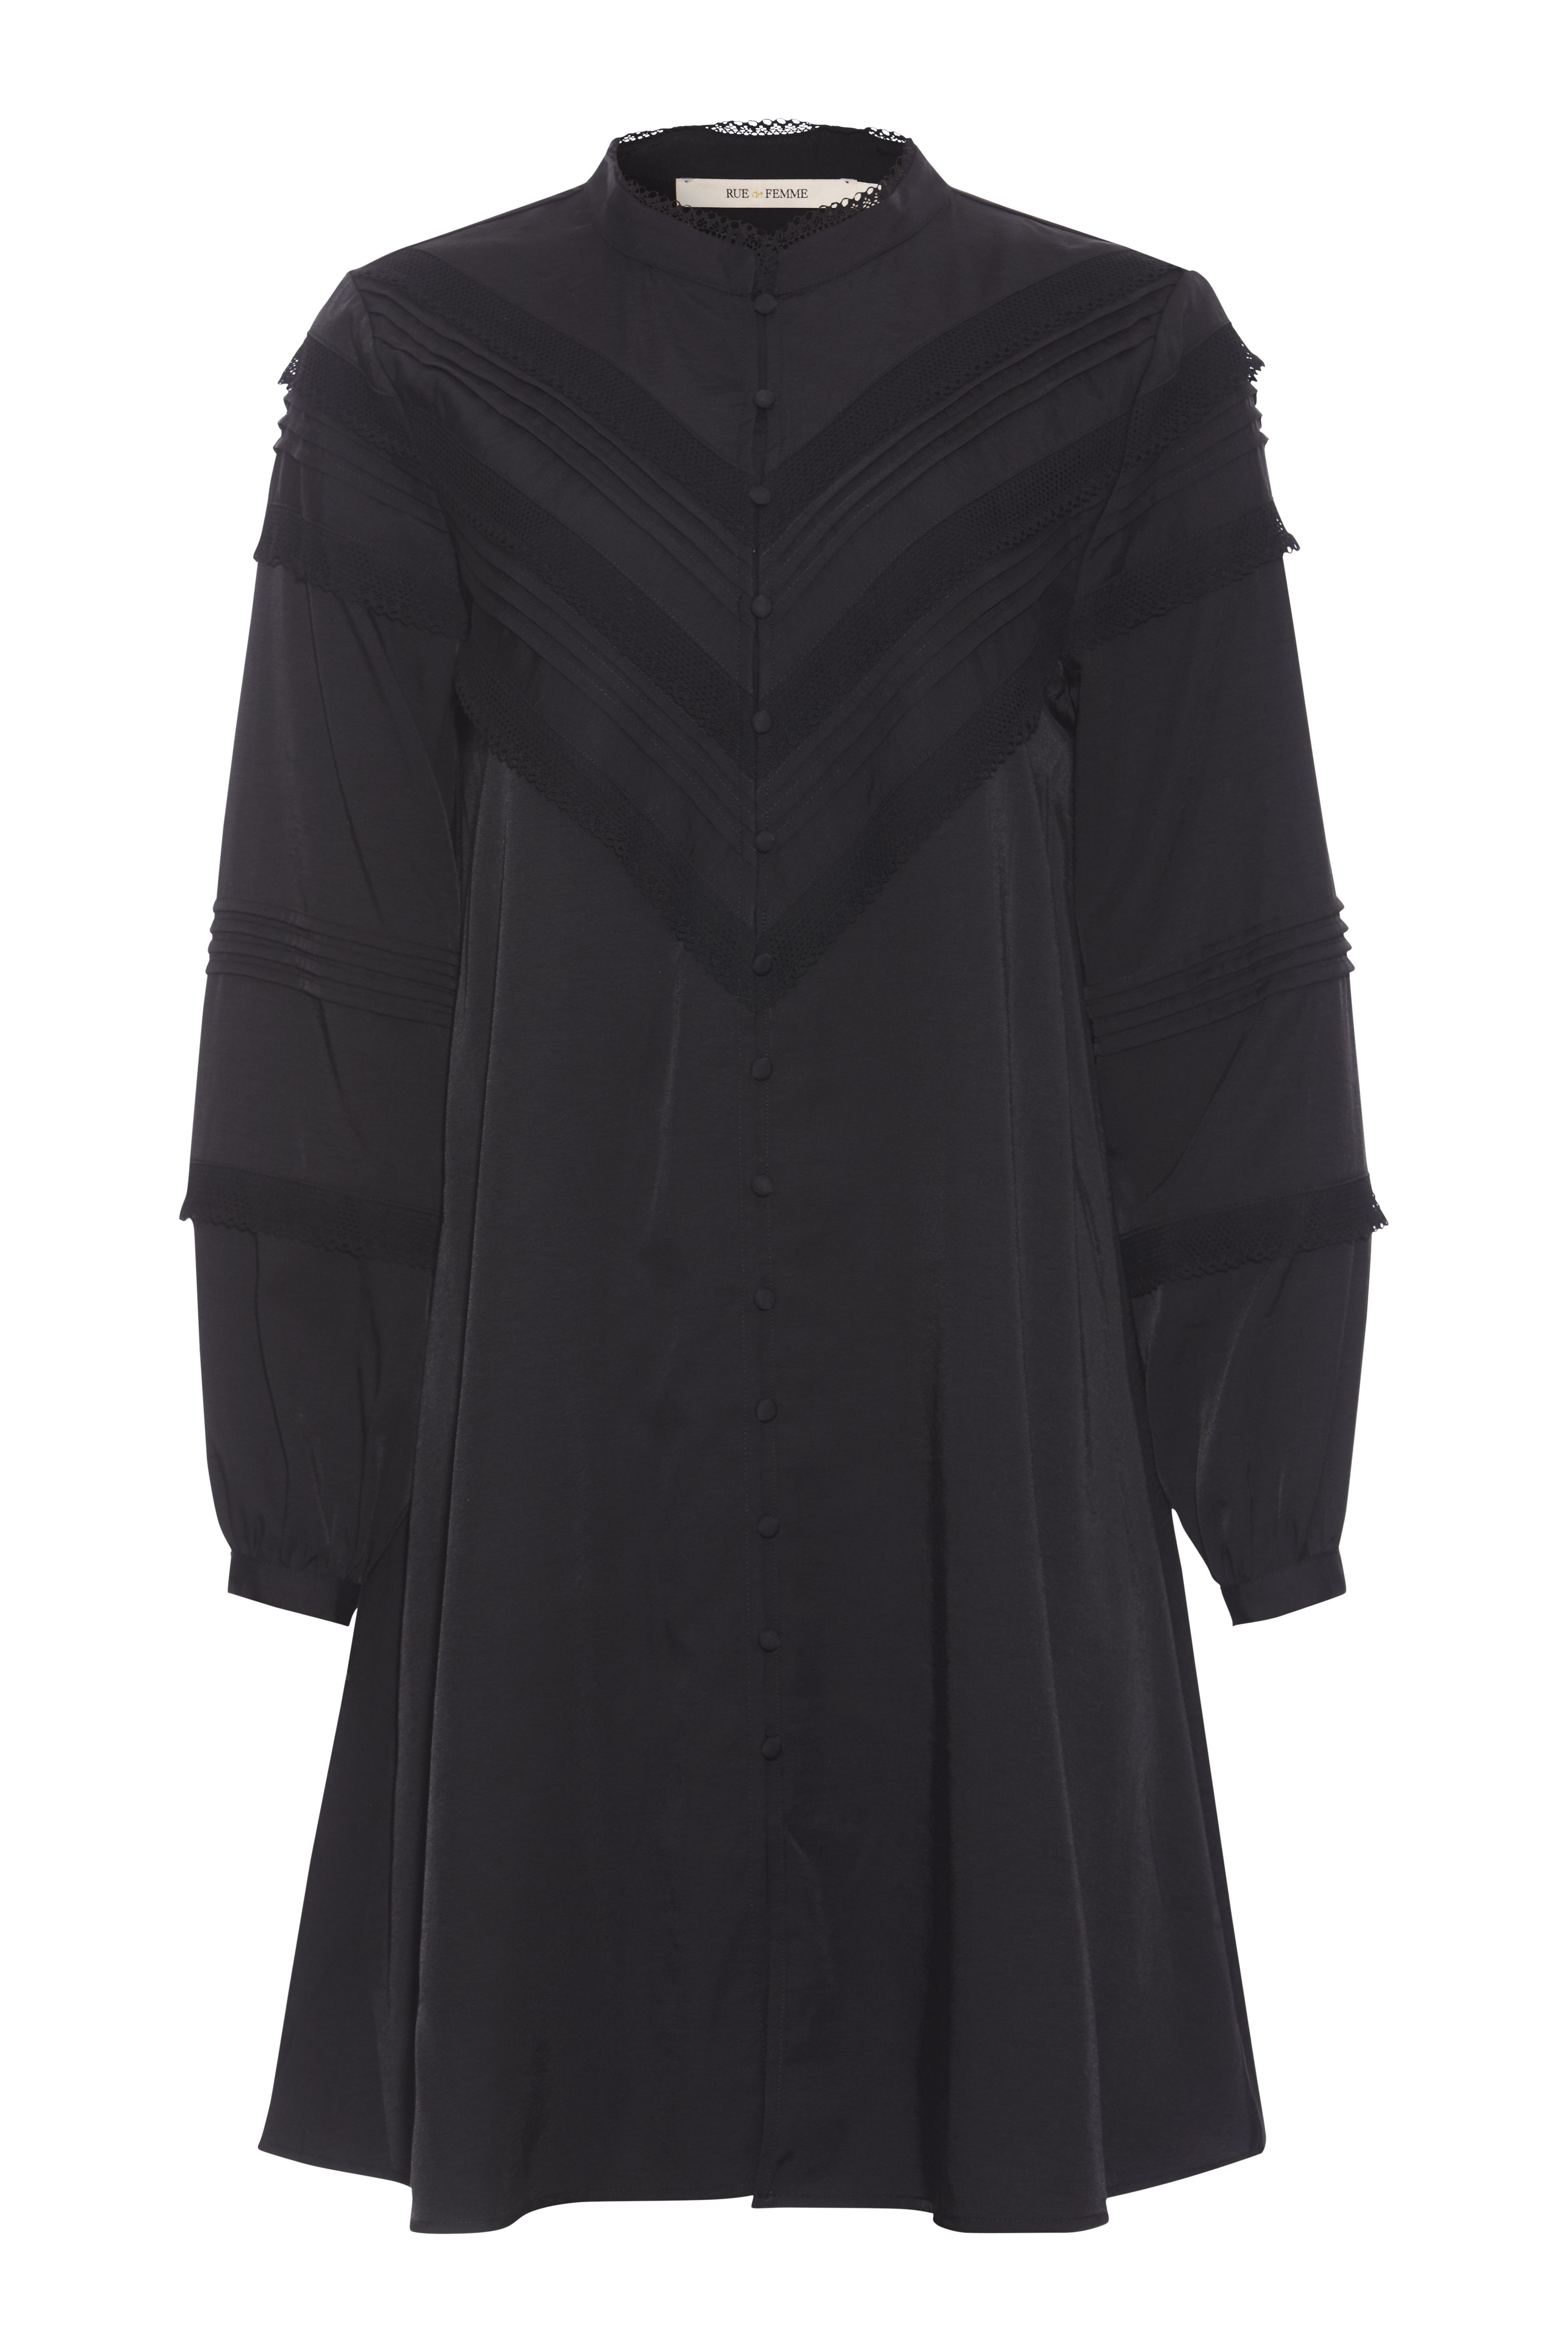 Rue de Femme Jewel kjole, black, large